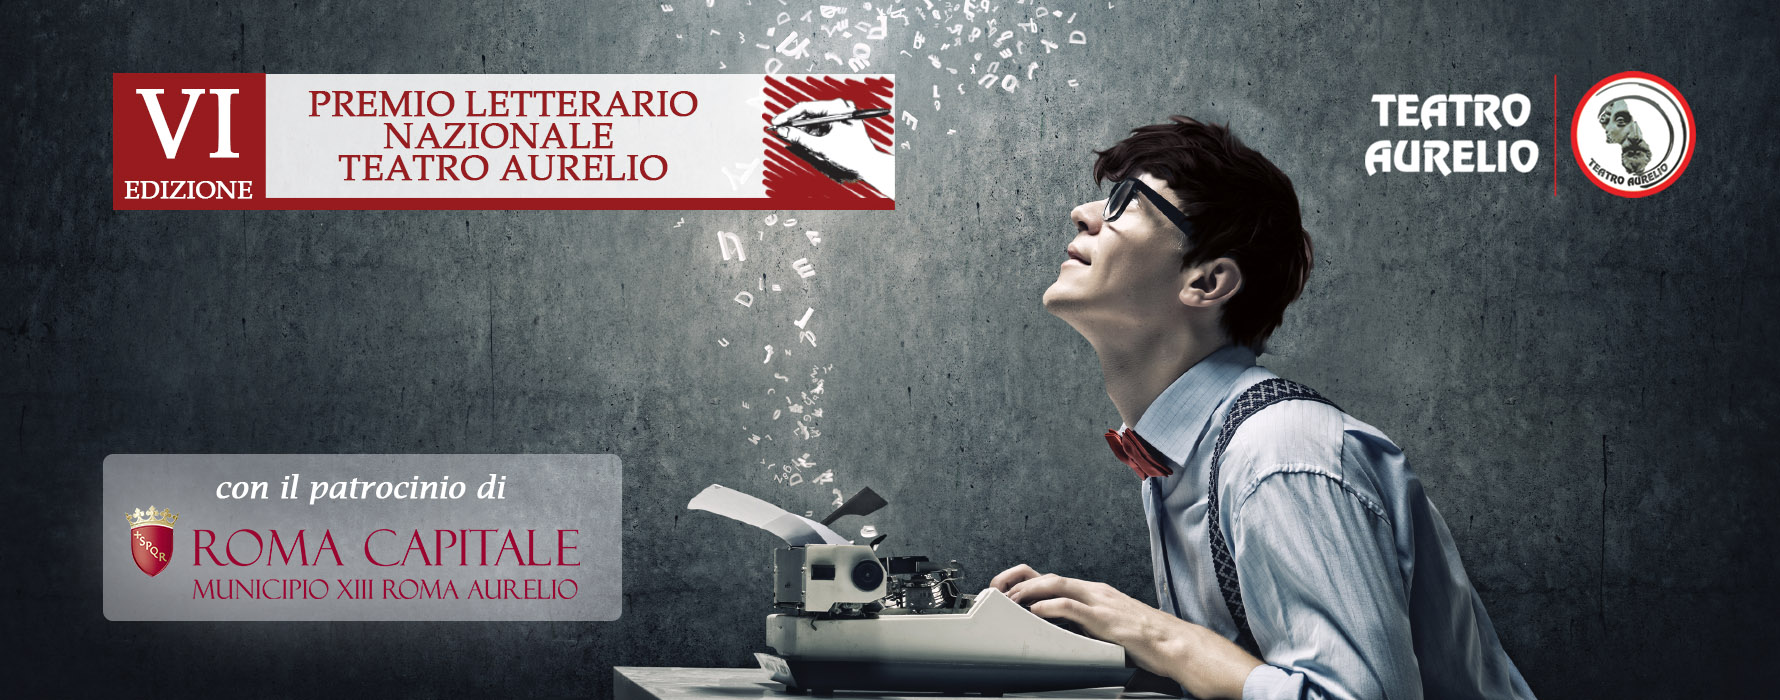 Banner premio letterario - Teatro Aurelio - VI Edizione